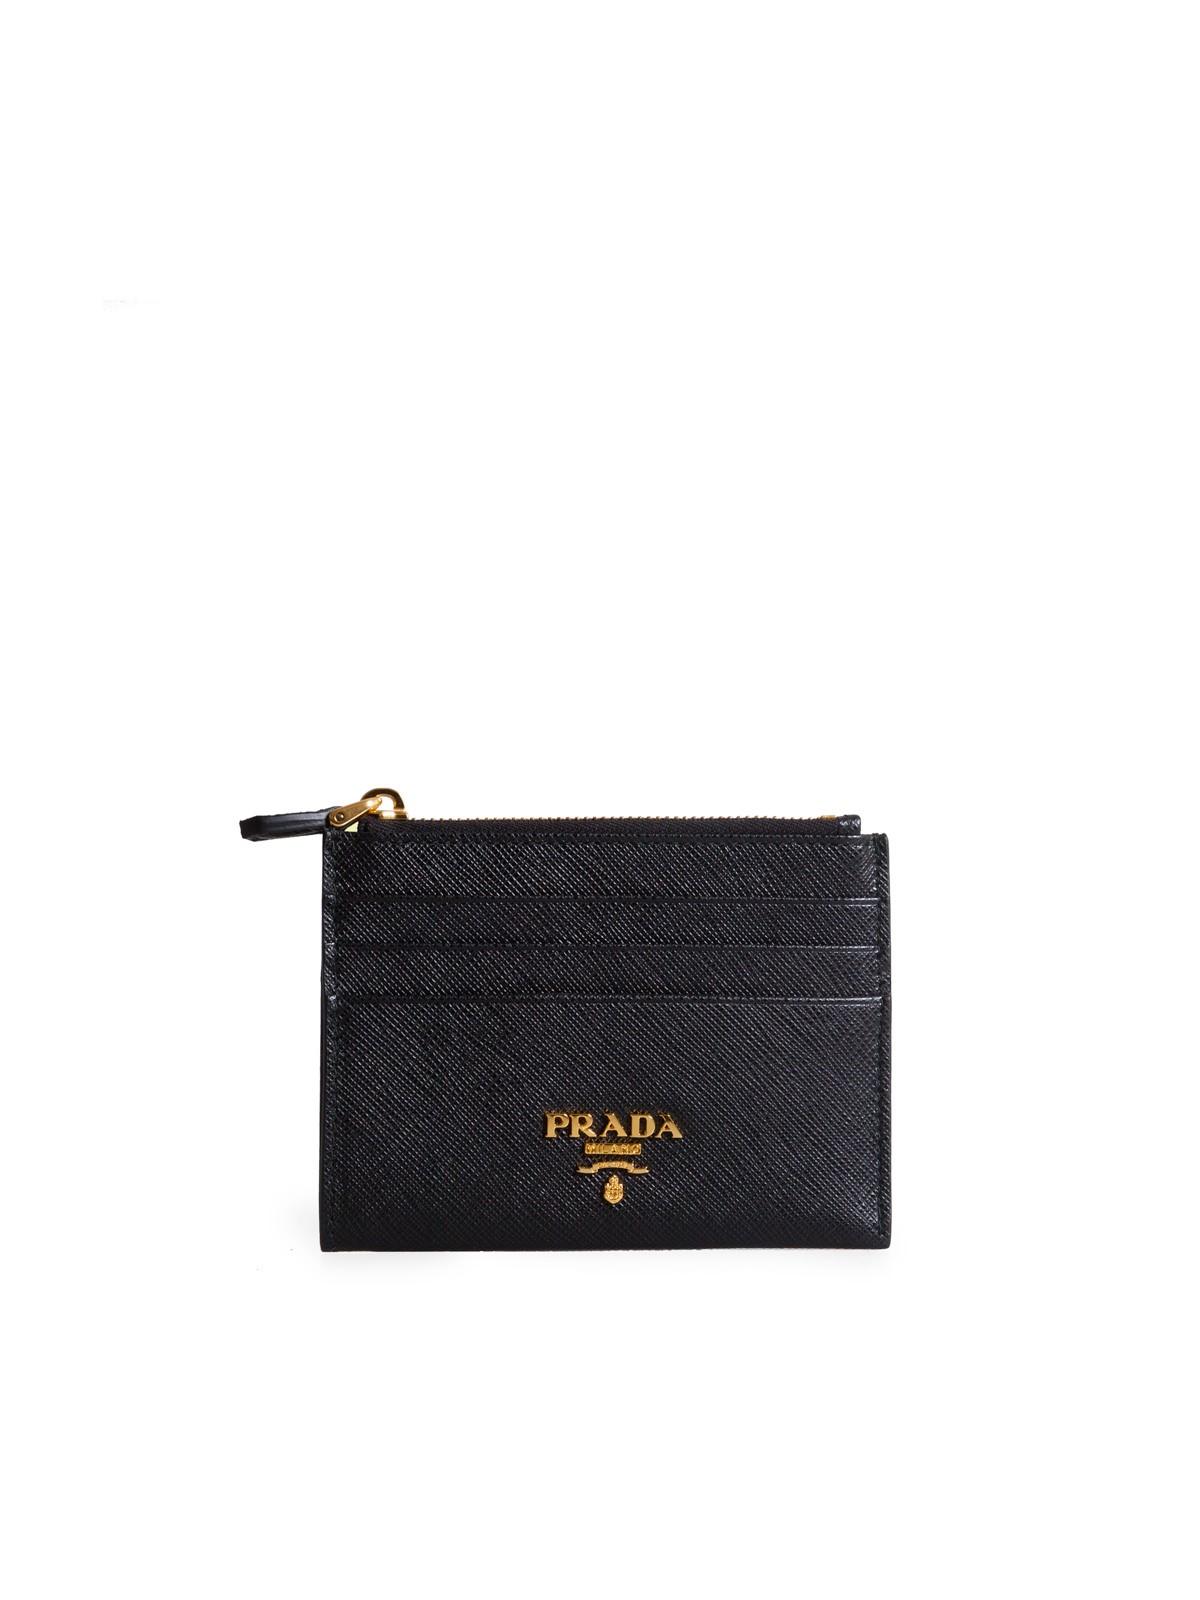 a5297bfa185502 release date prada saffiano leather card holder wallet d9d92 f9852; new  zealand prada card holder b549a 3c6cf